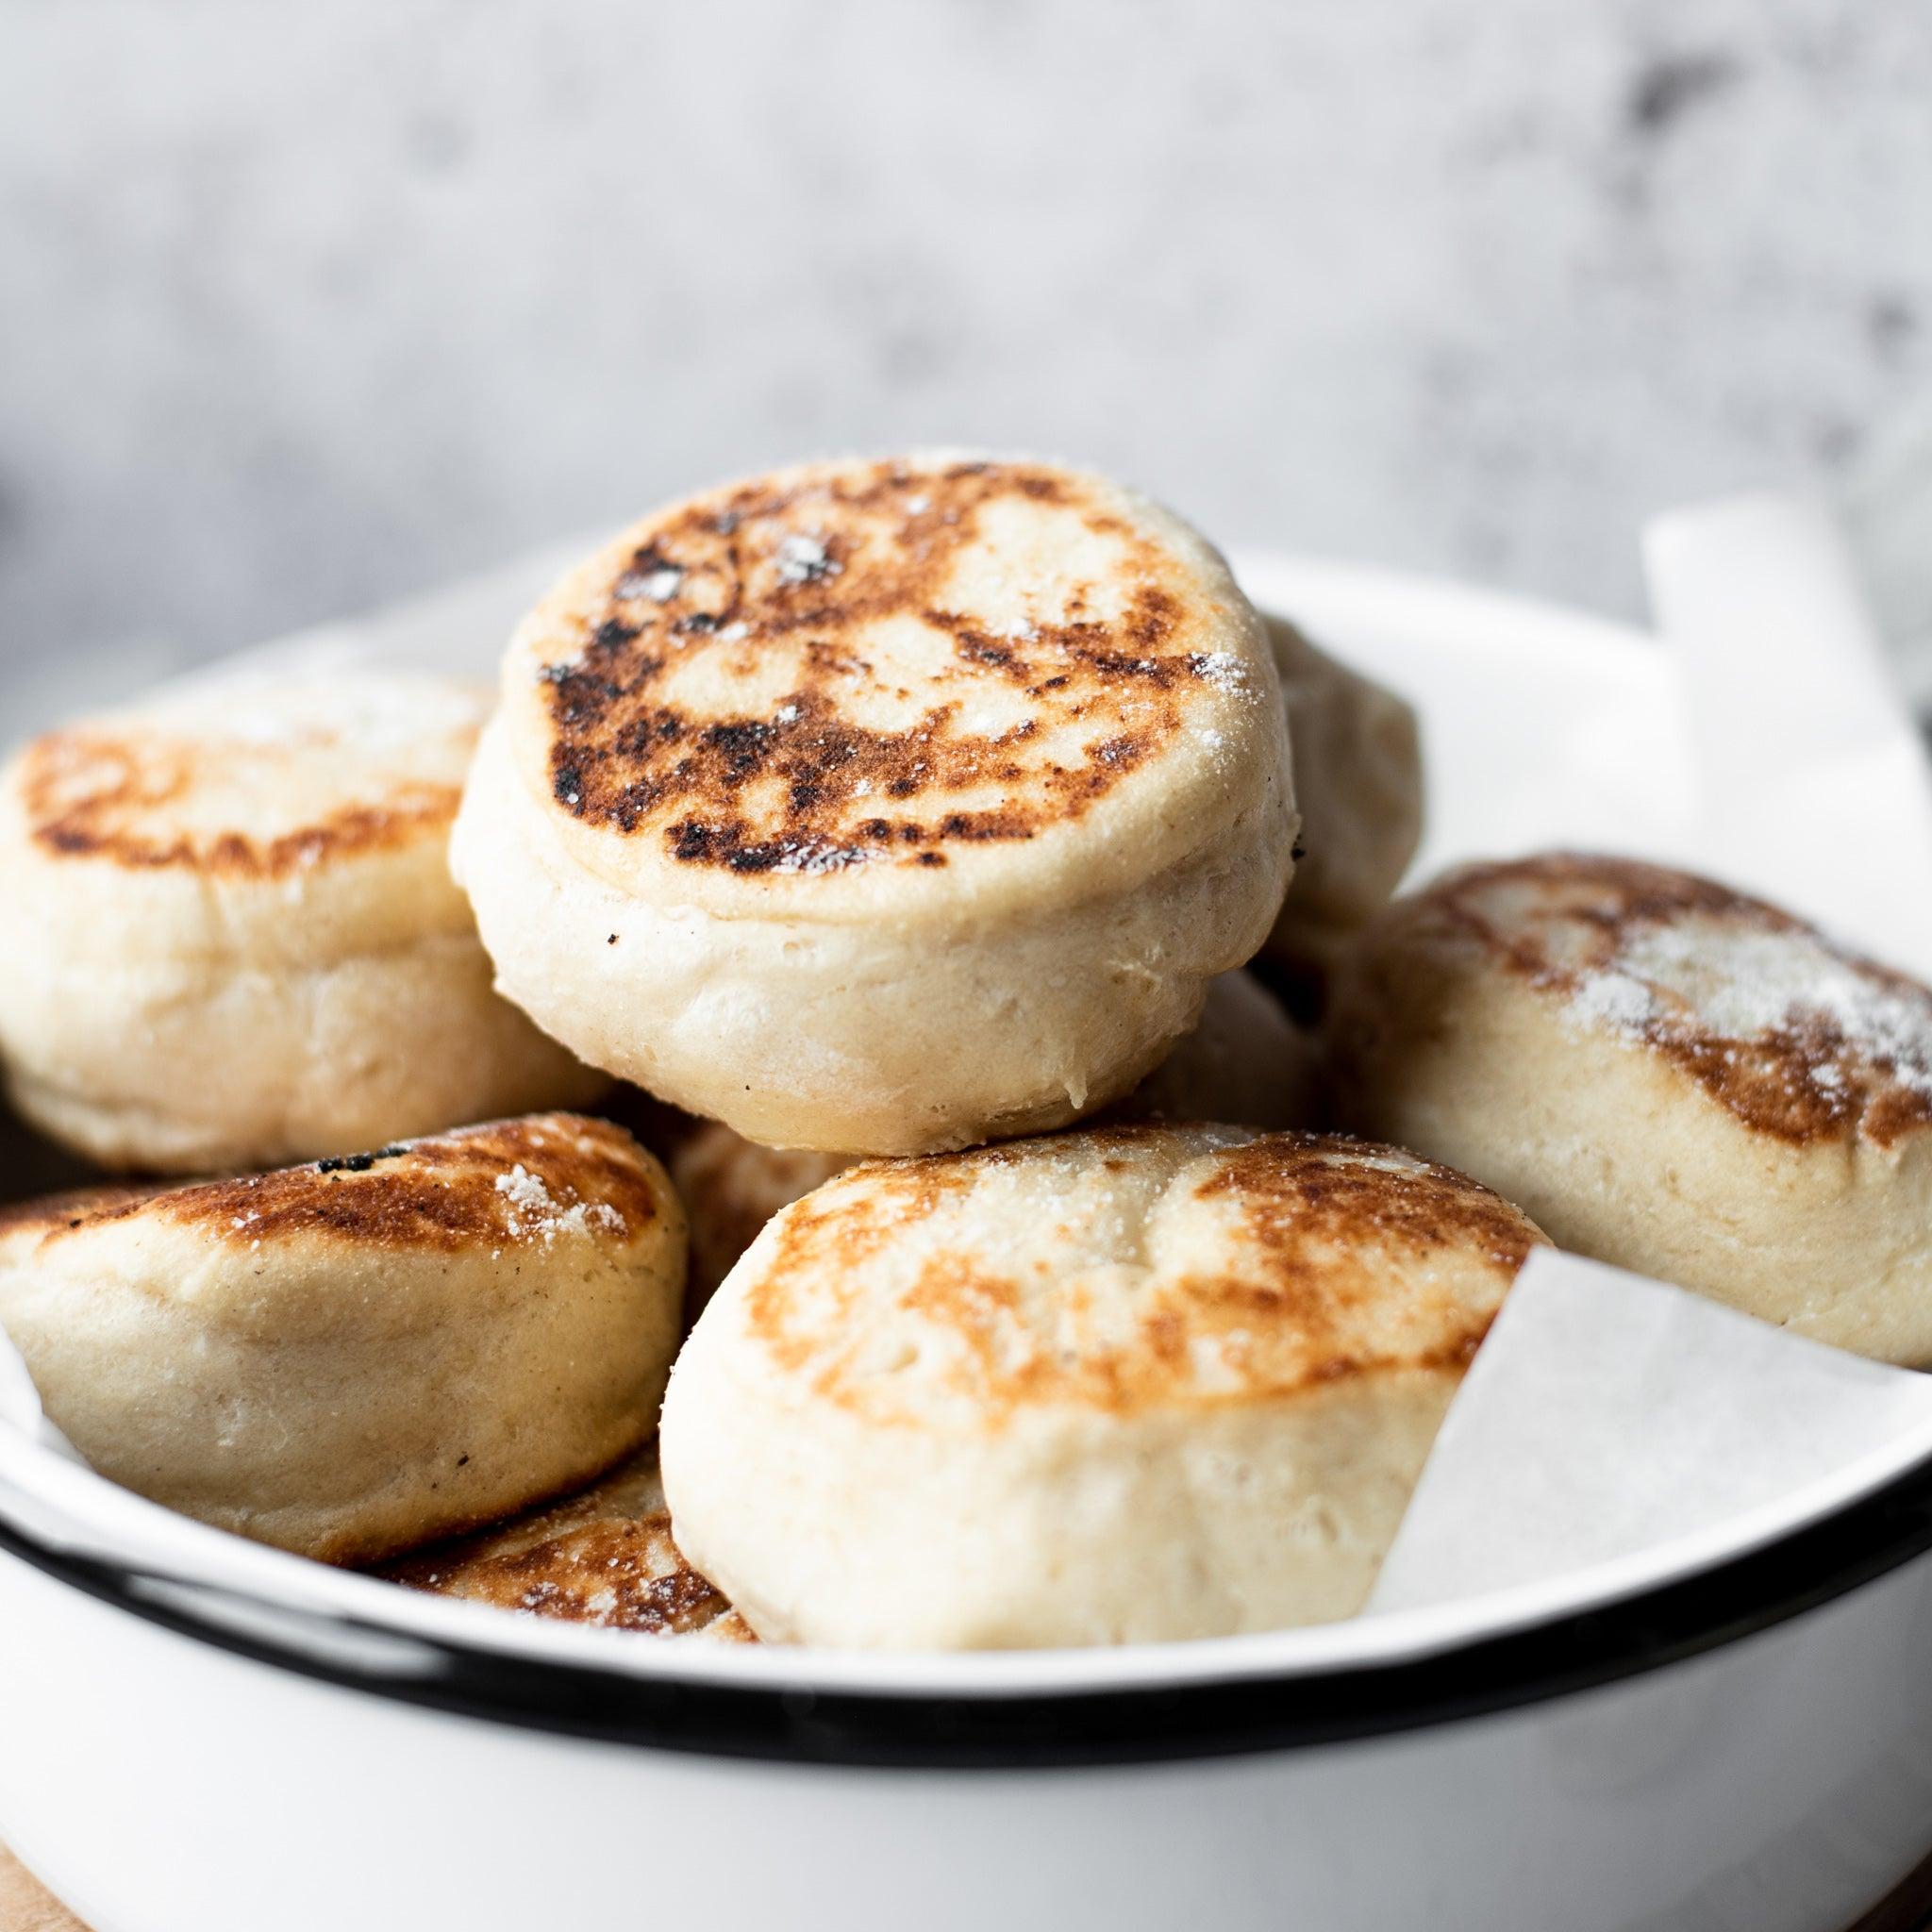 Allinsons-English-Muffins-1-1-Baking-Mad-5.jpg